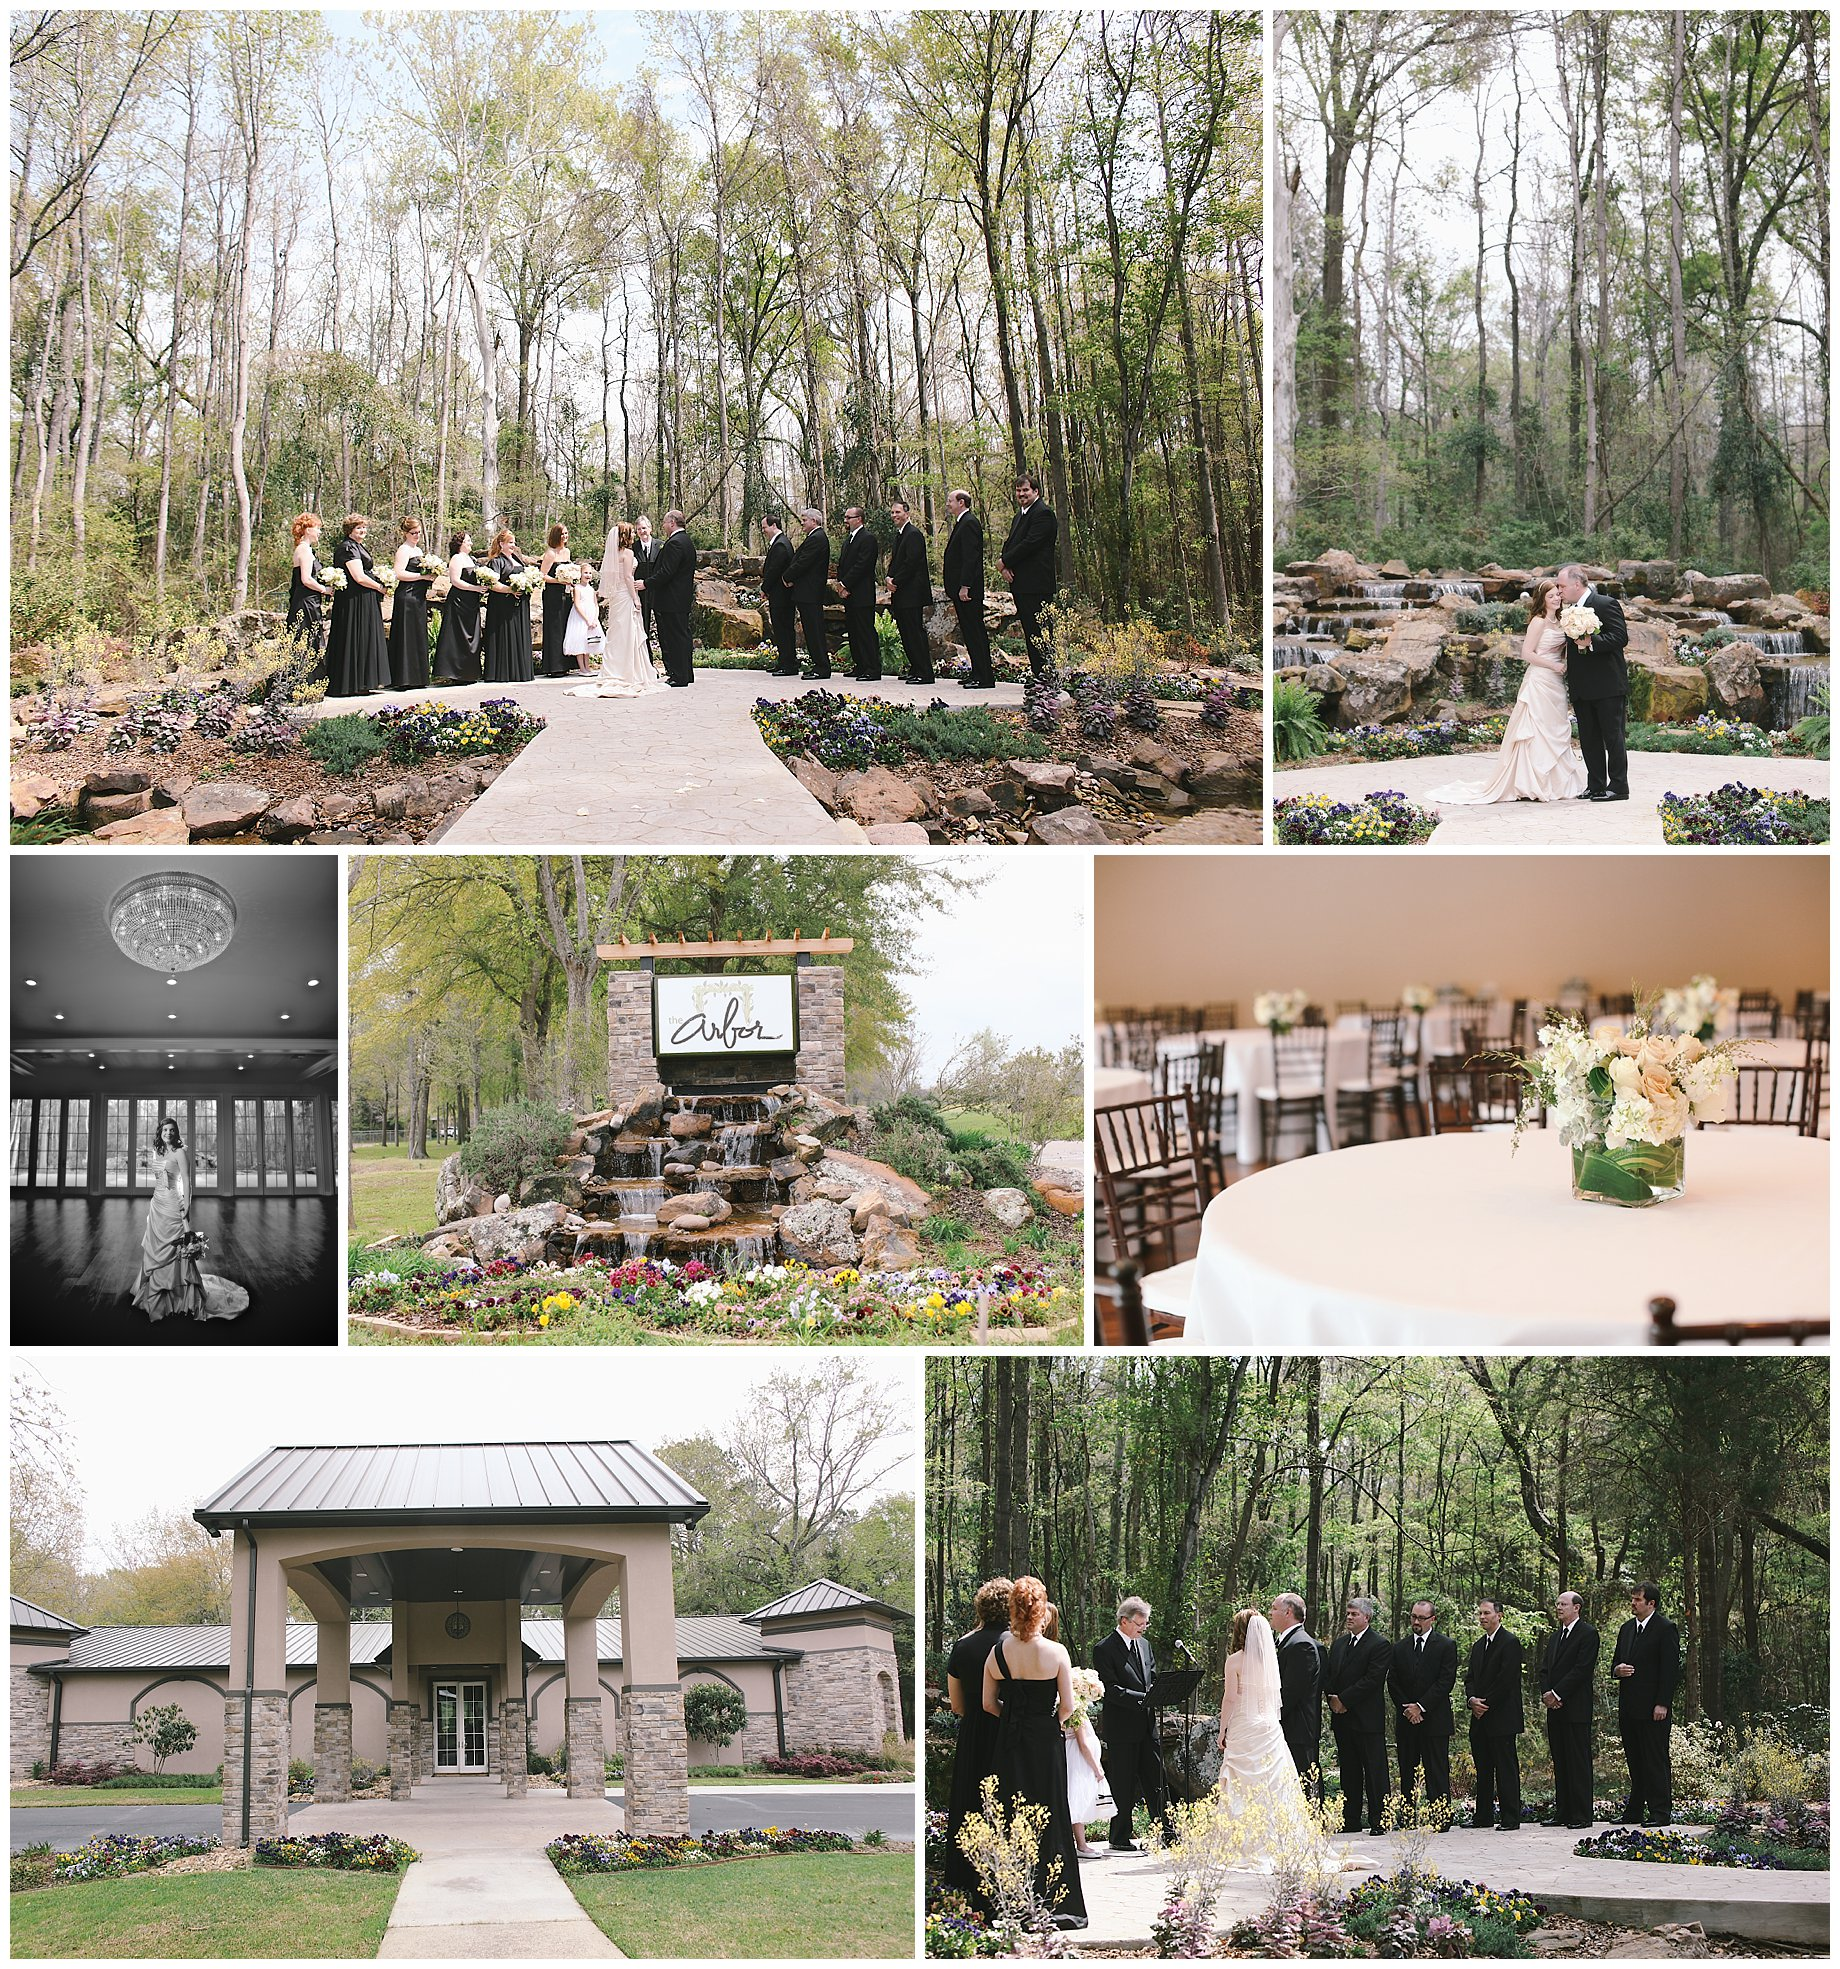 top-10-east-texas-wedding-venues-arbor-01